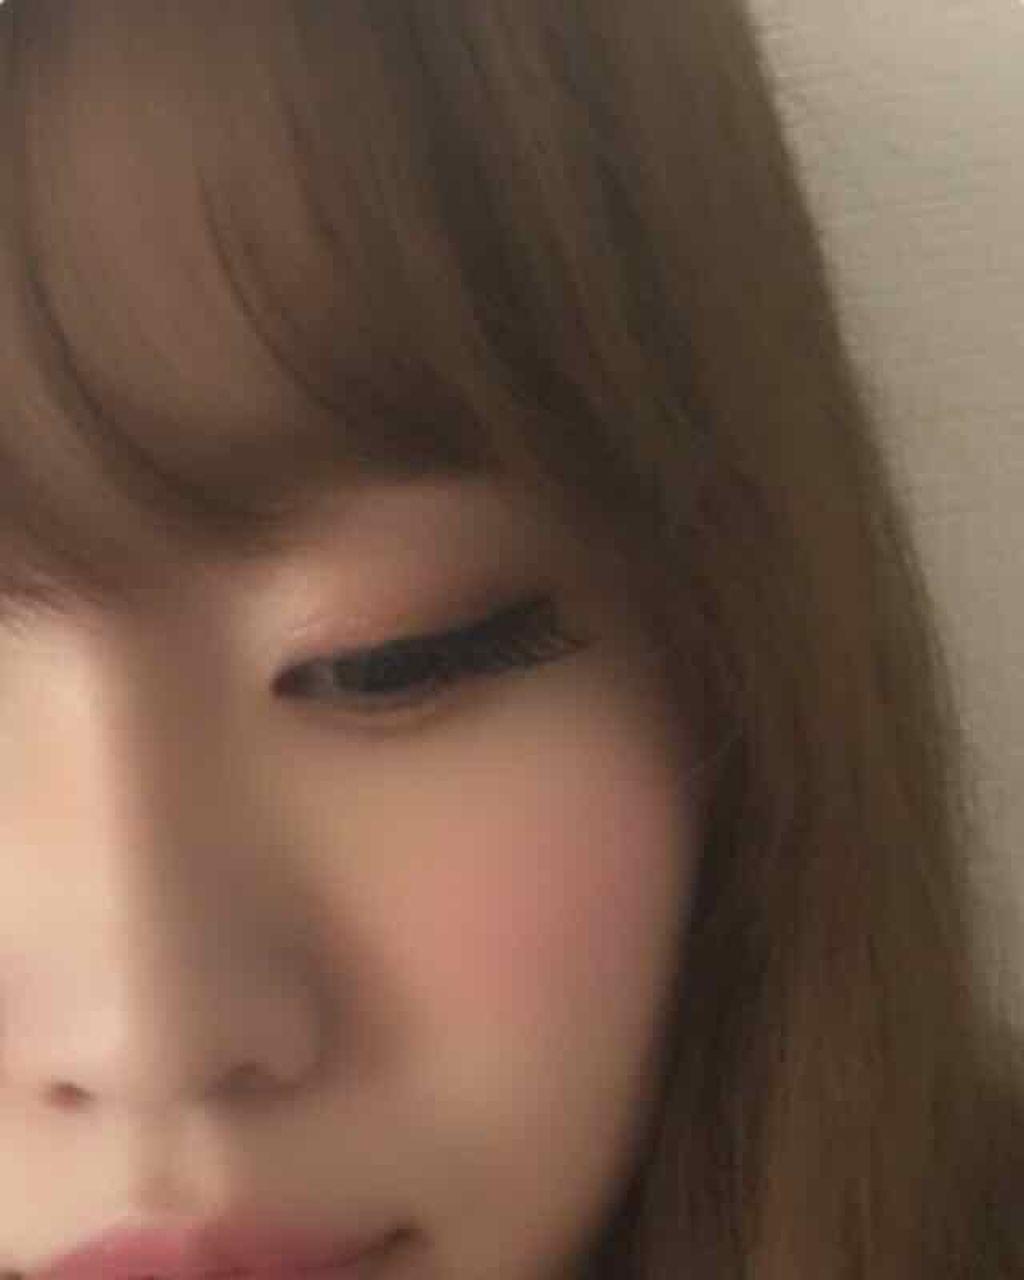 https://cdn.lipscosme.com/image/05264696558883be52f1a280-1552291828-thumb.png